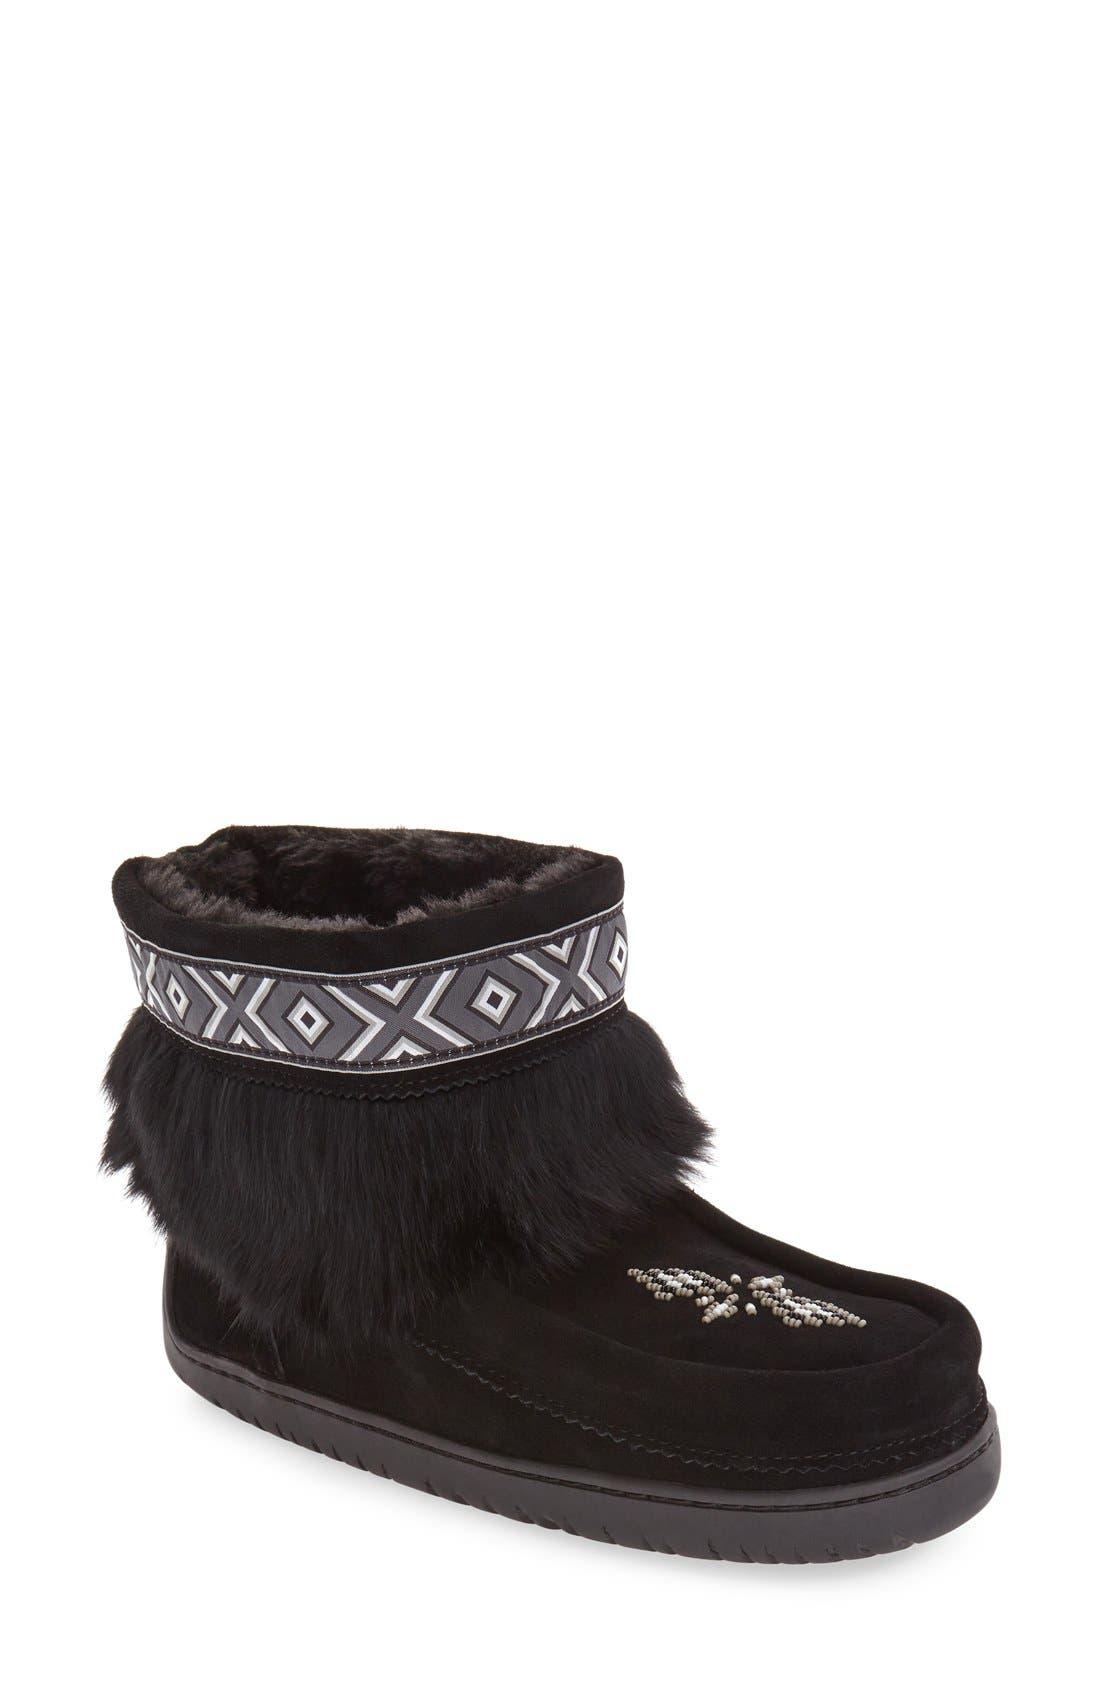 'Keewatin' Genuine Shearling and Rabbit Fur Boot,                         Main,                         color, 001